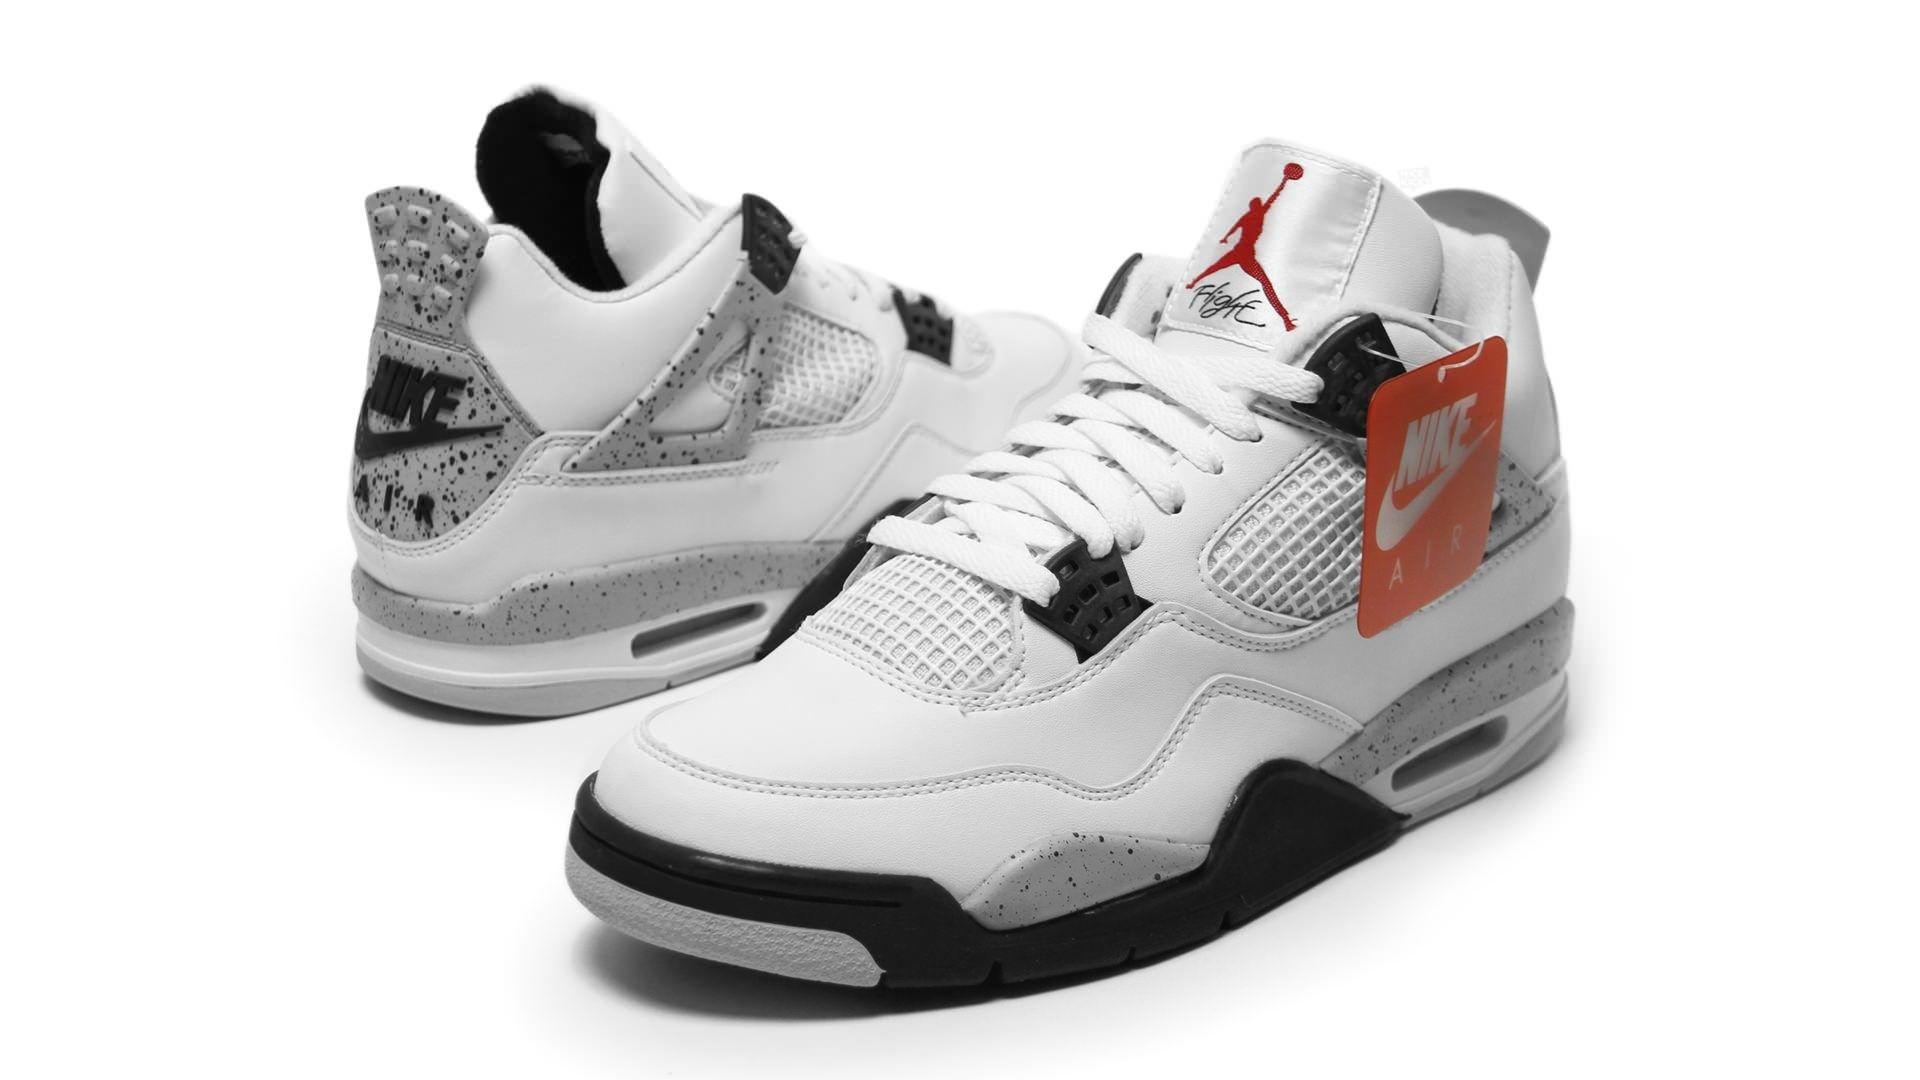 Weekly Wallpaper: Air Jordan 4 White/Cement For years, Jordan heads have  clamored to get the Air Jordan 4 back in its OG \u201cCookies and Cream\u201d  colorway.